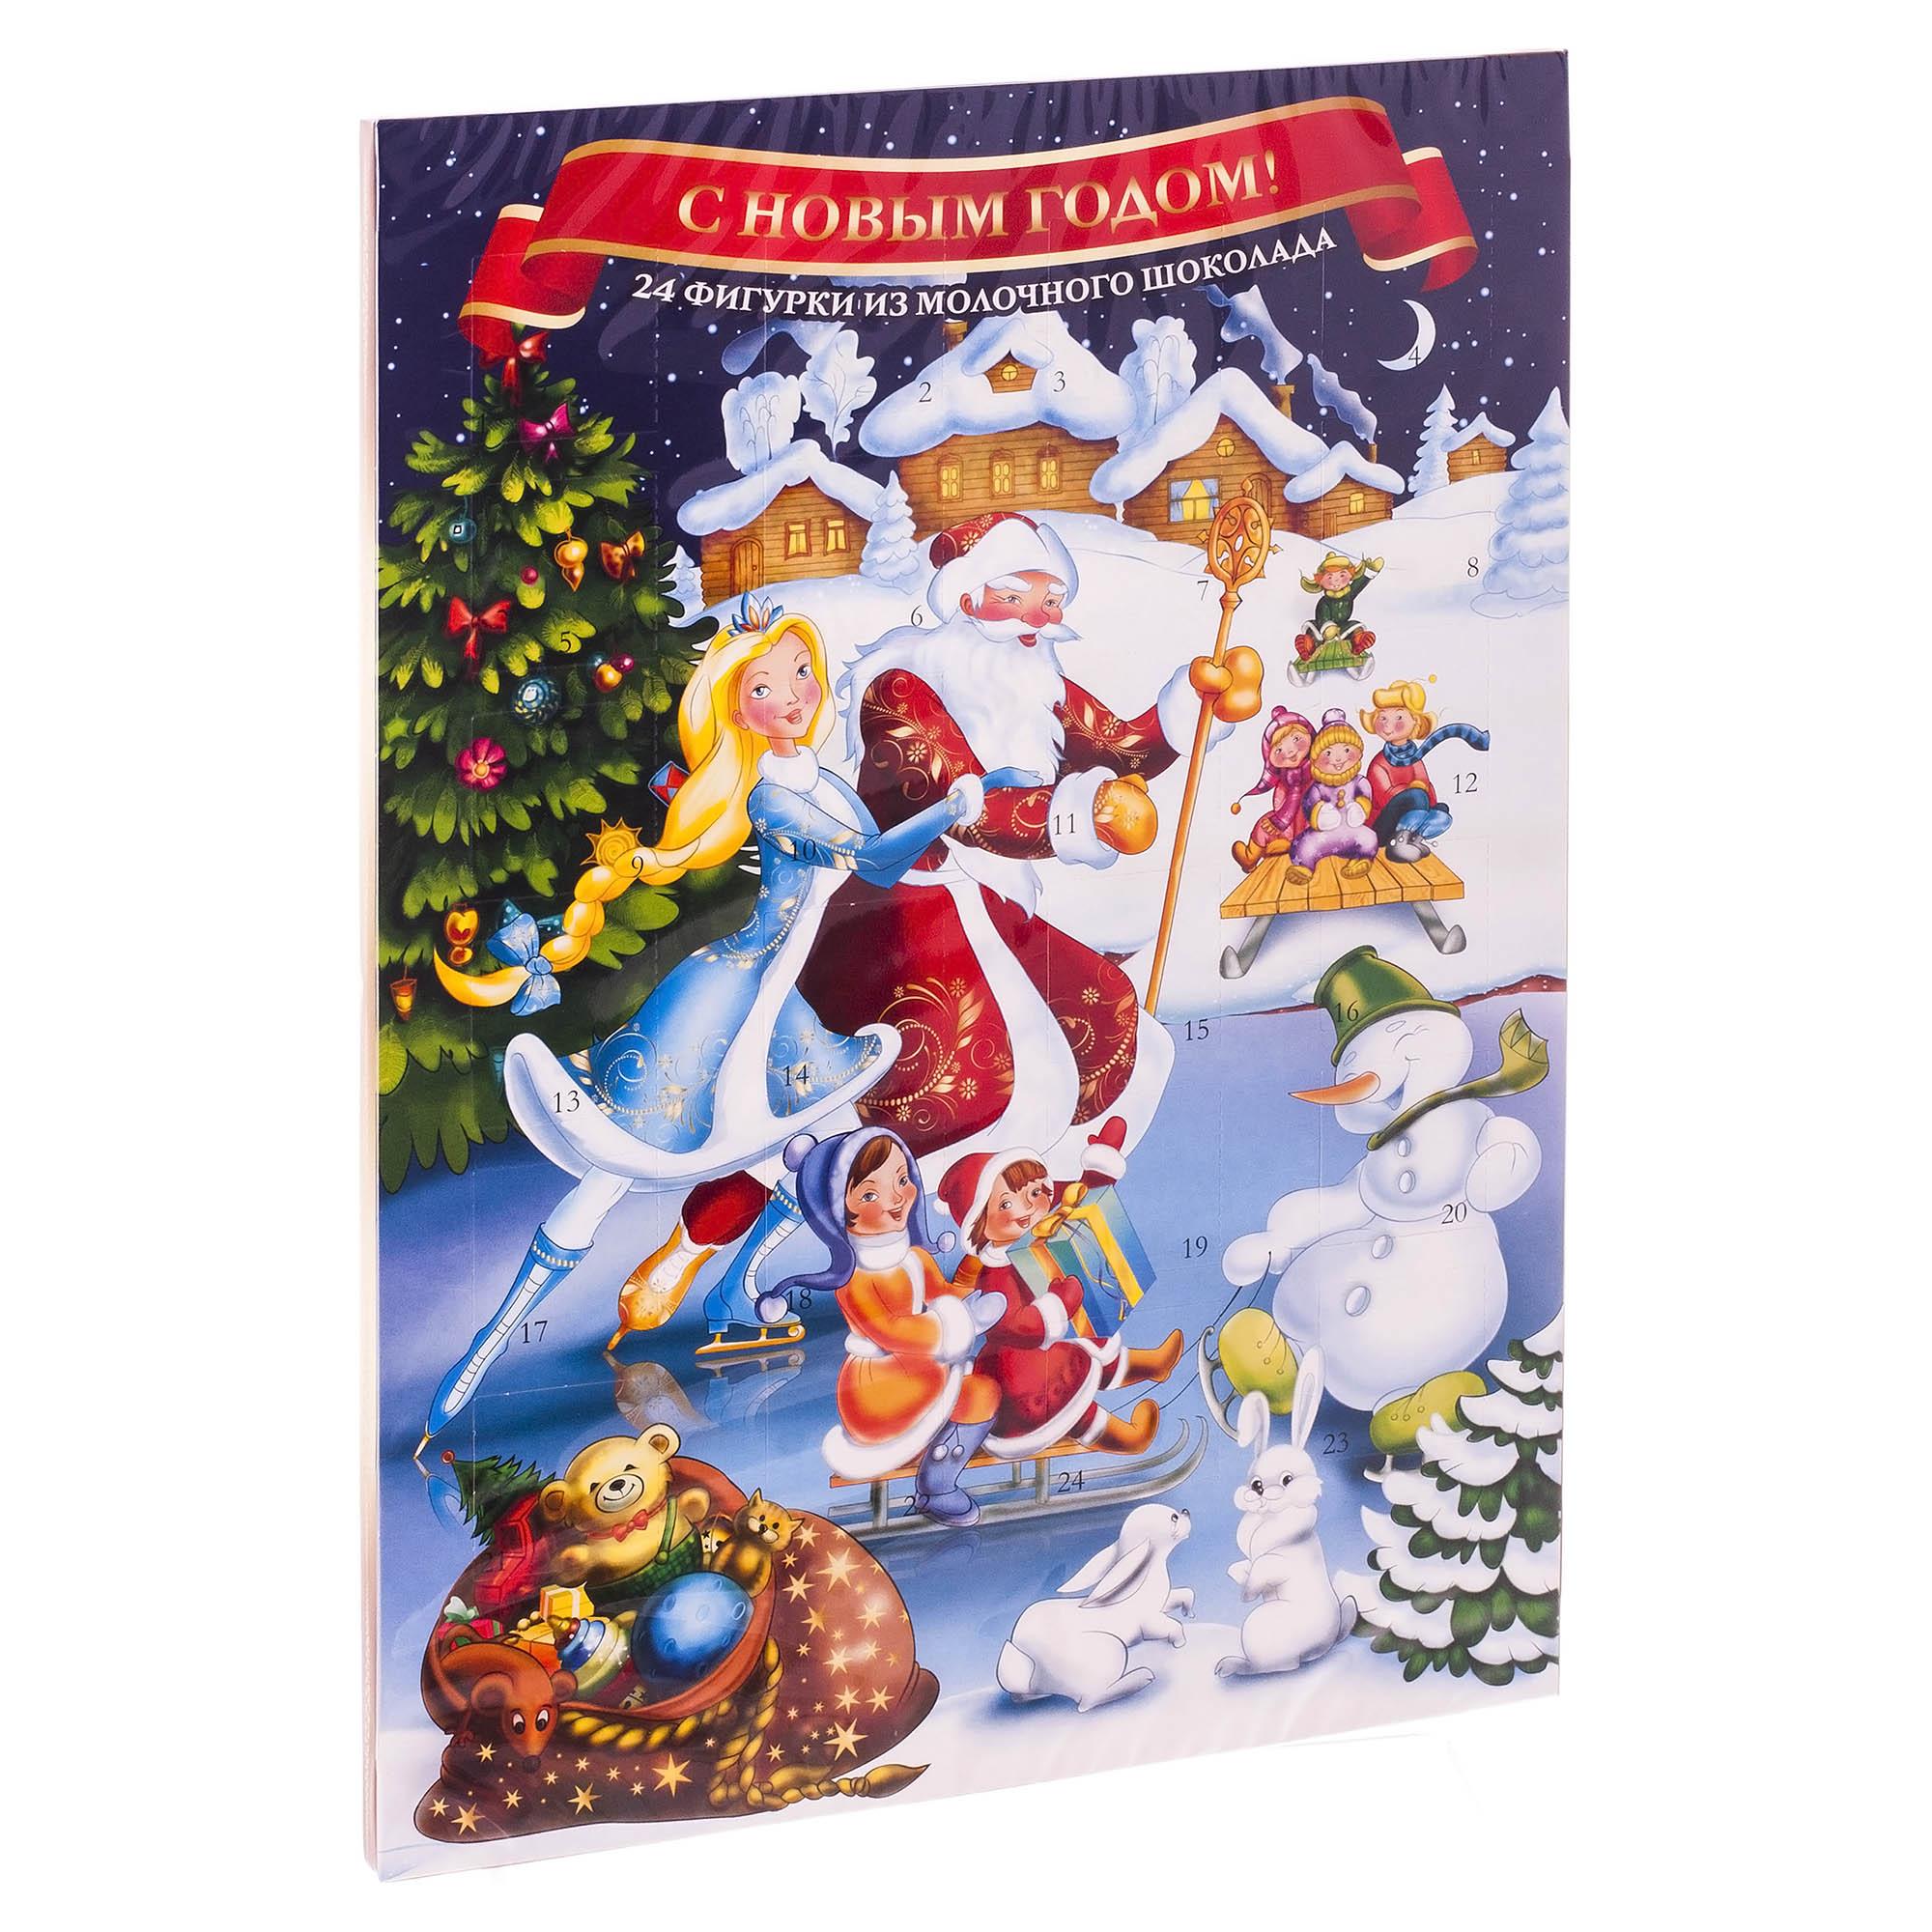 Новогодний шоколадный календарь 75гр Pomorzanka (PM-1-2)